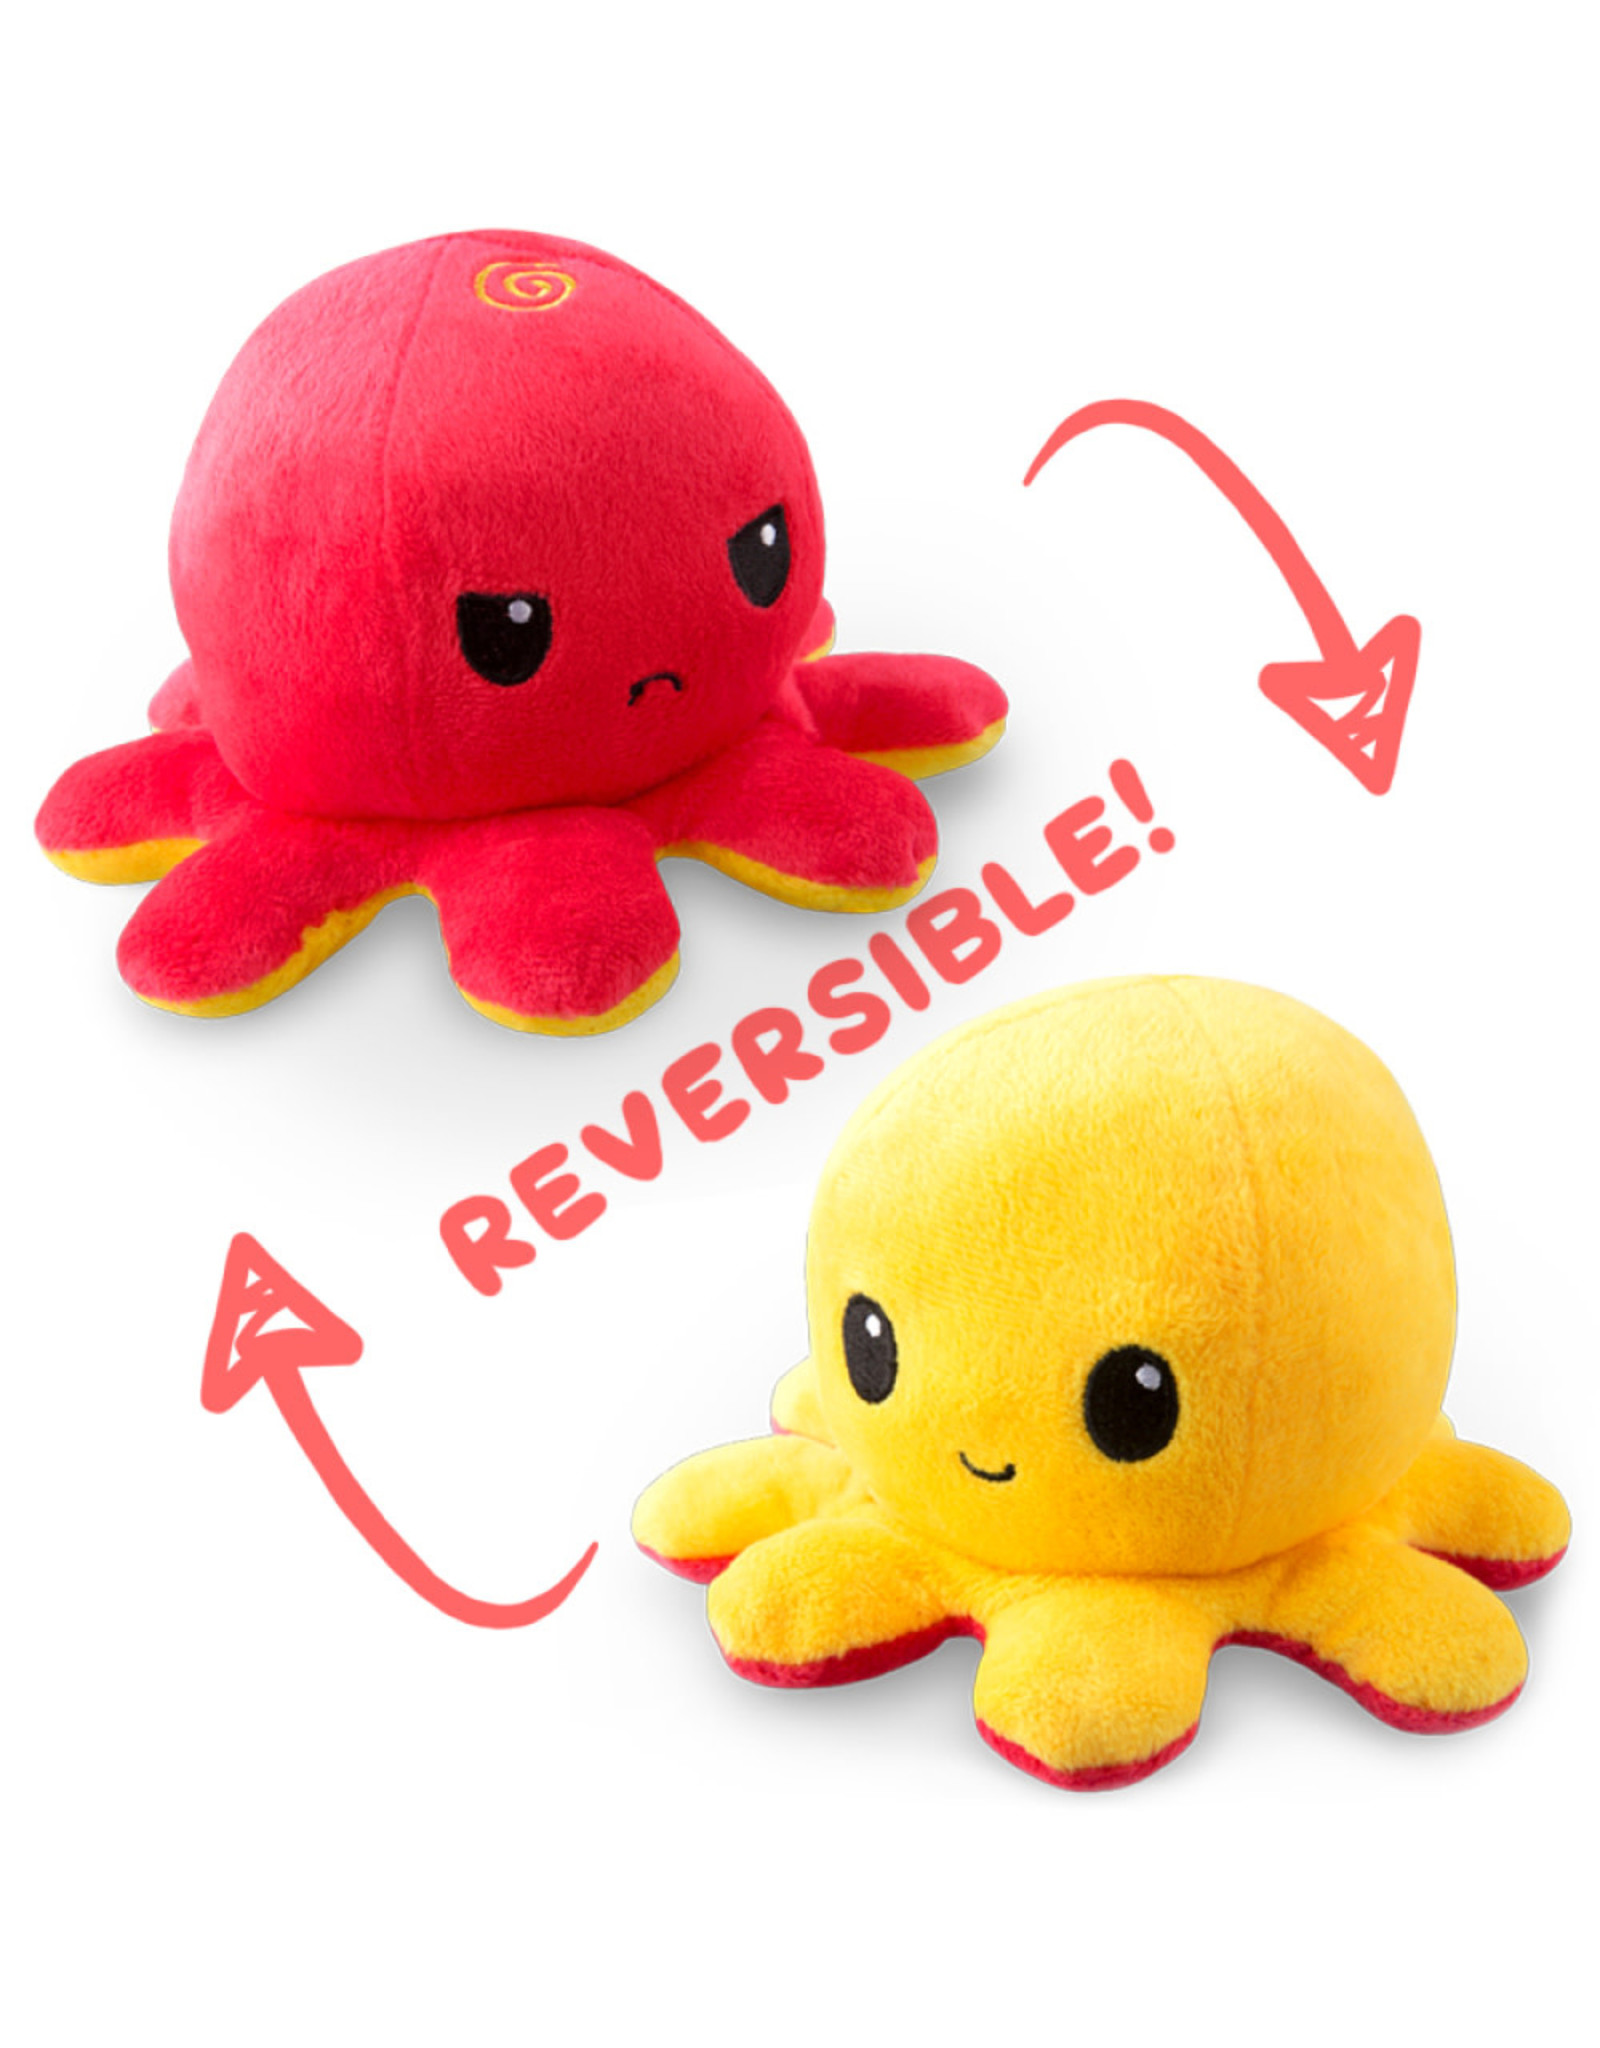 Reversible Octopus Mini - Red/Yellow